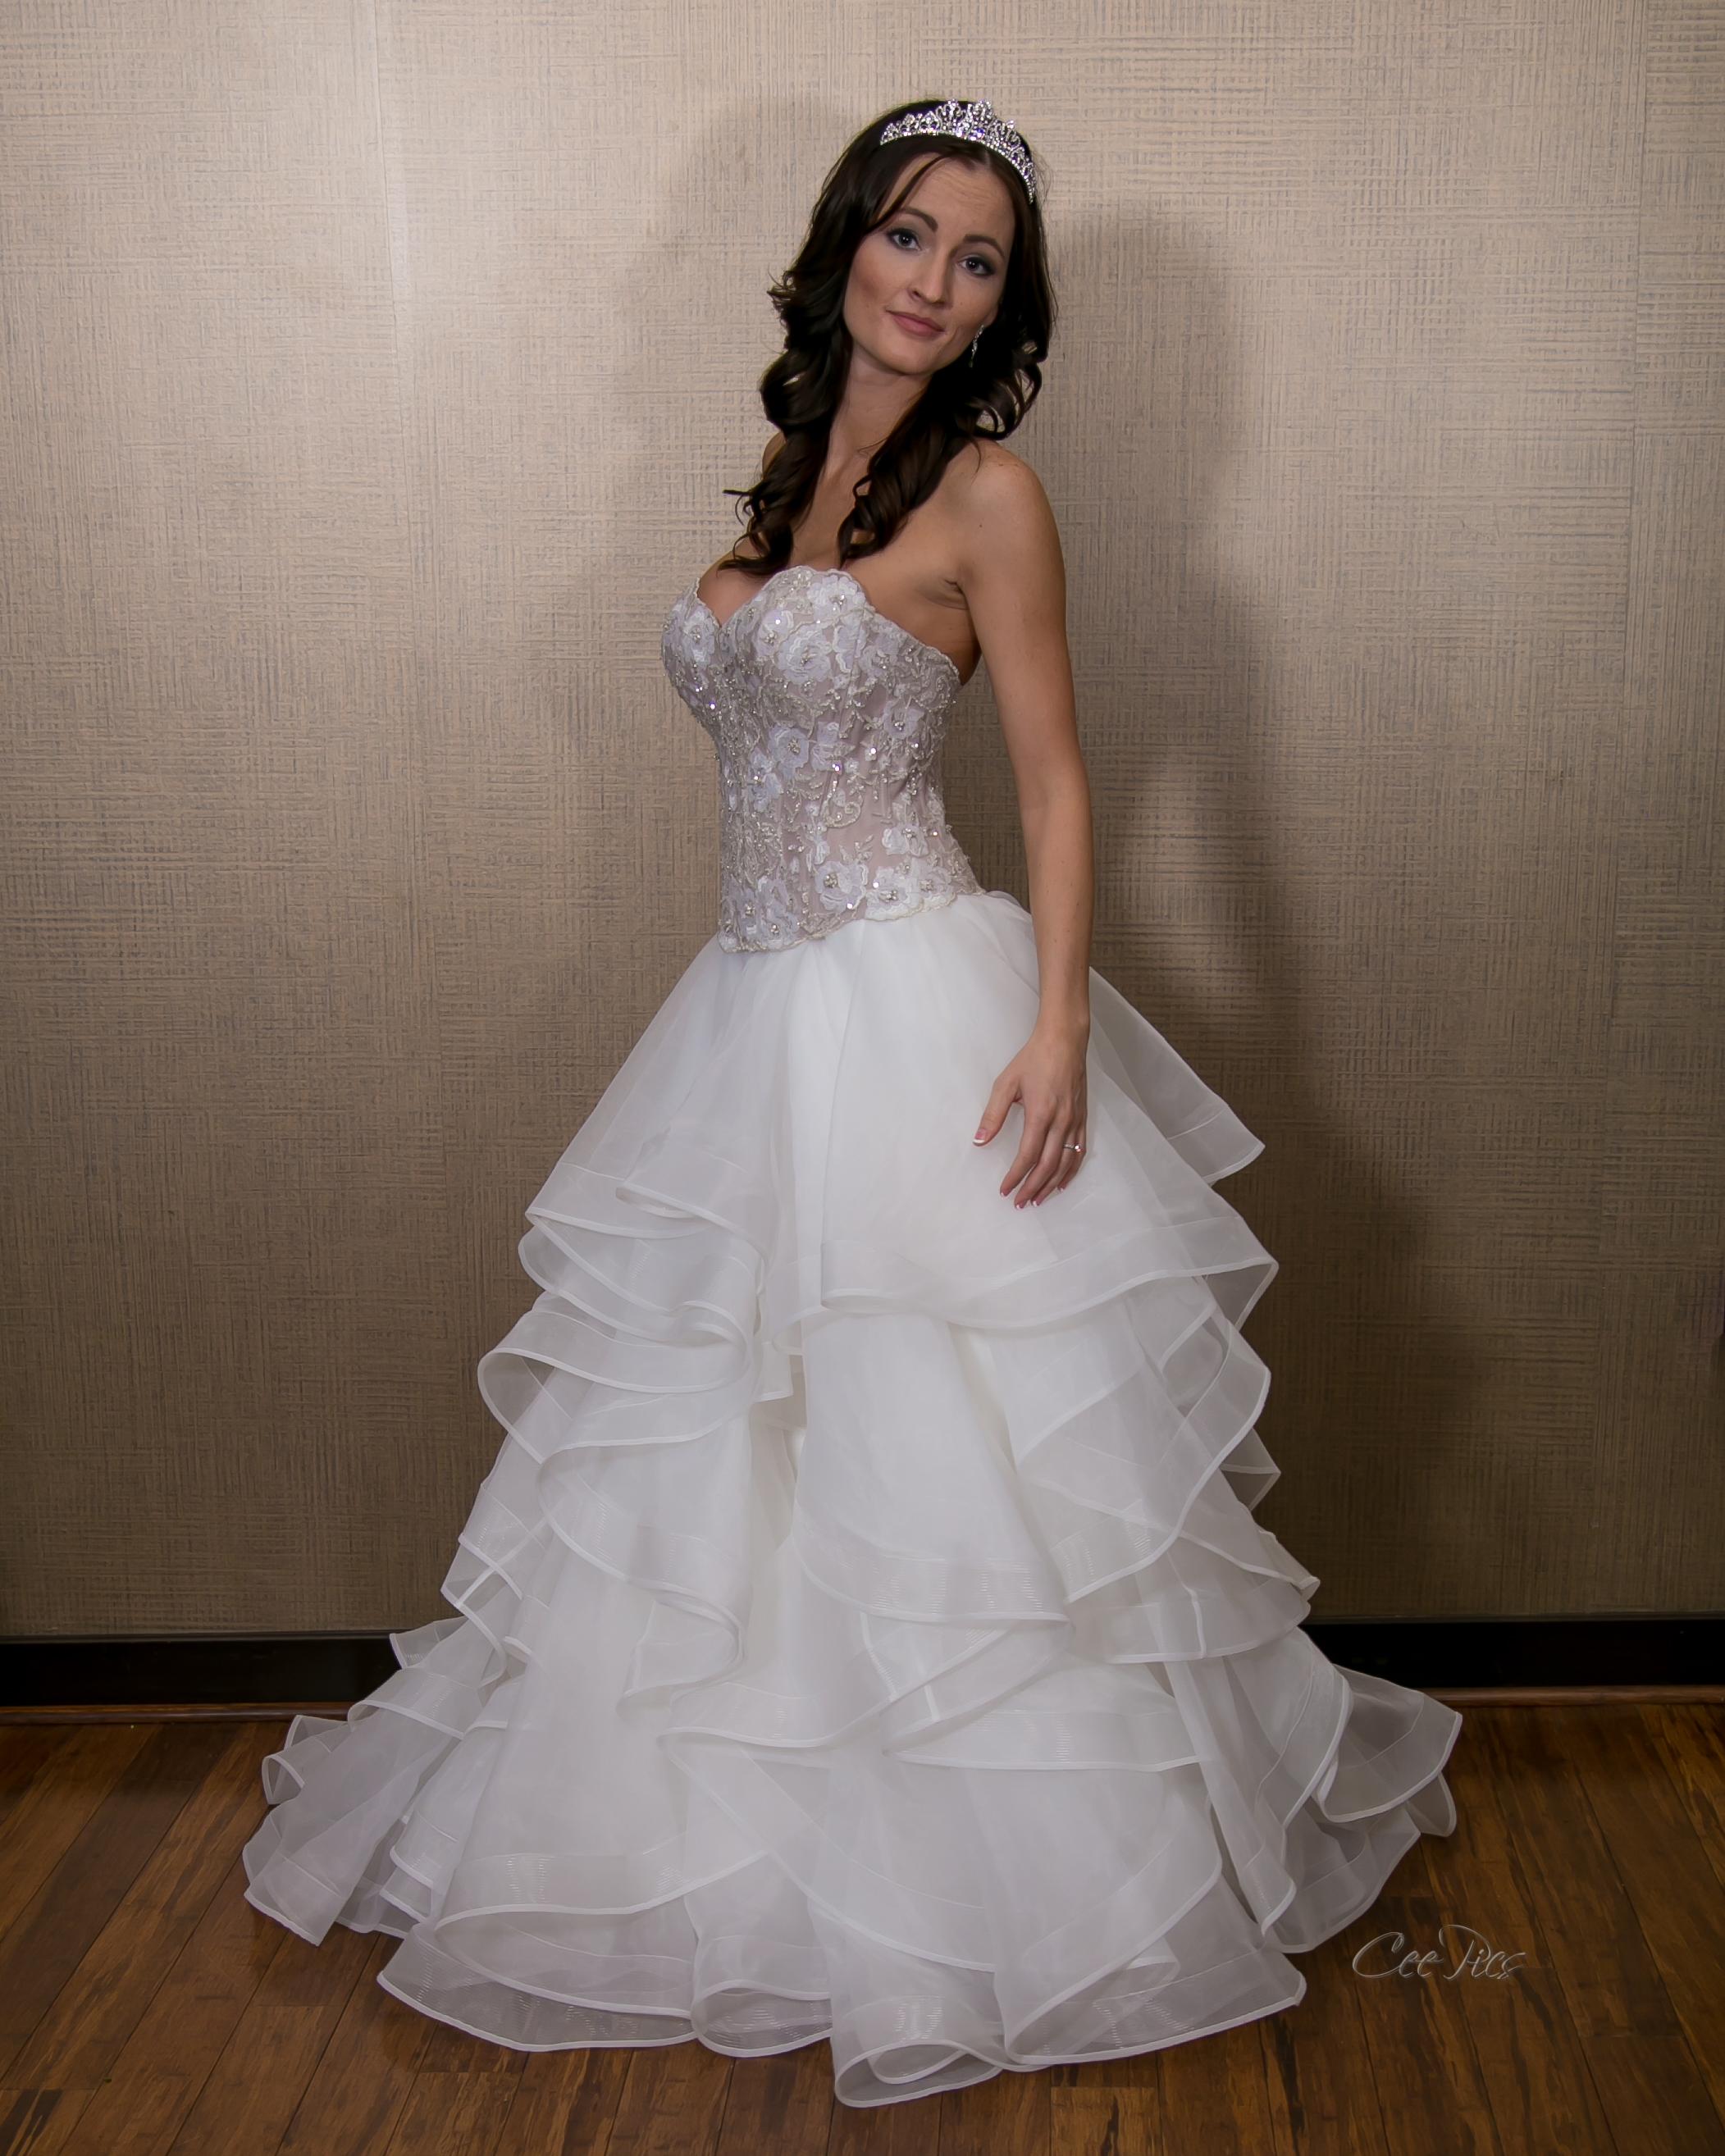 Nashville_Wedding_Photographer_Photography_DJ_MC_Lighting_Photobooth_Franklin_Bowling_Gallatin-46.jpg